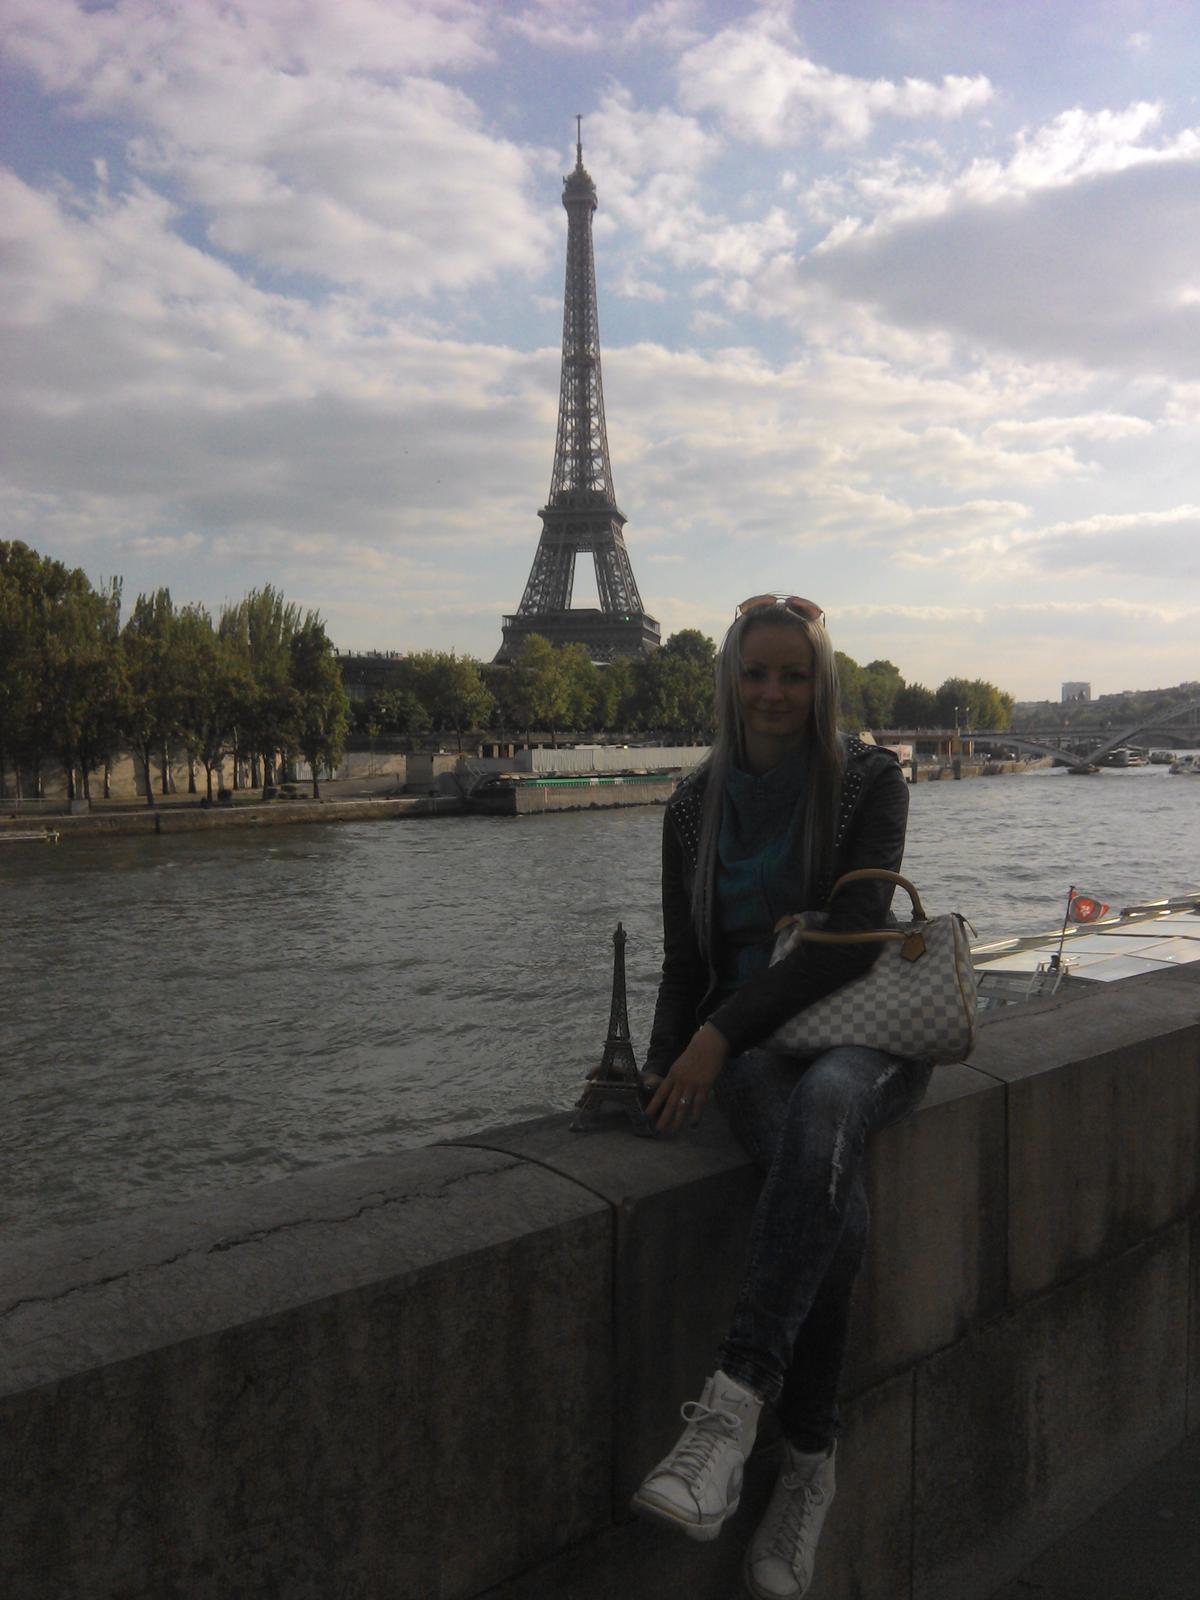 Zásnuby v Paríži 3.5.2014 :) - Obrázok č. 8